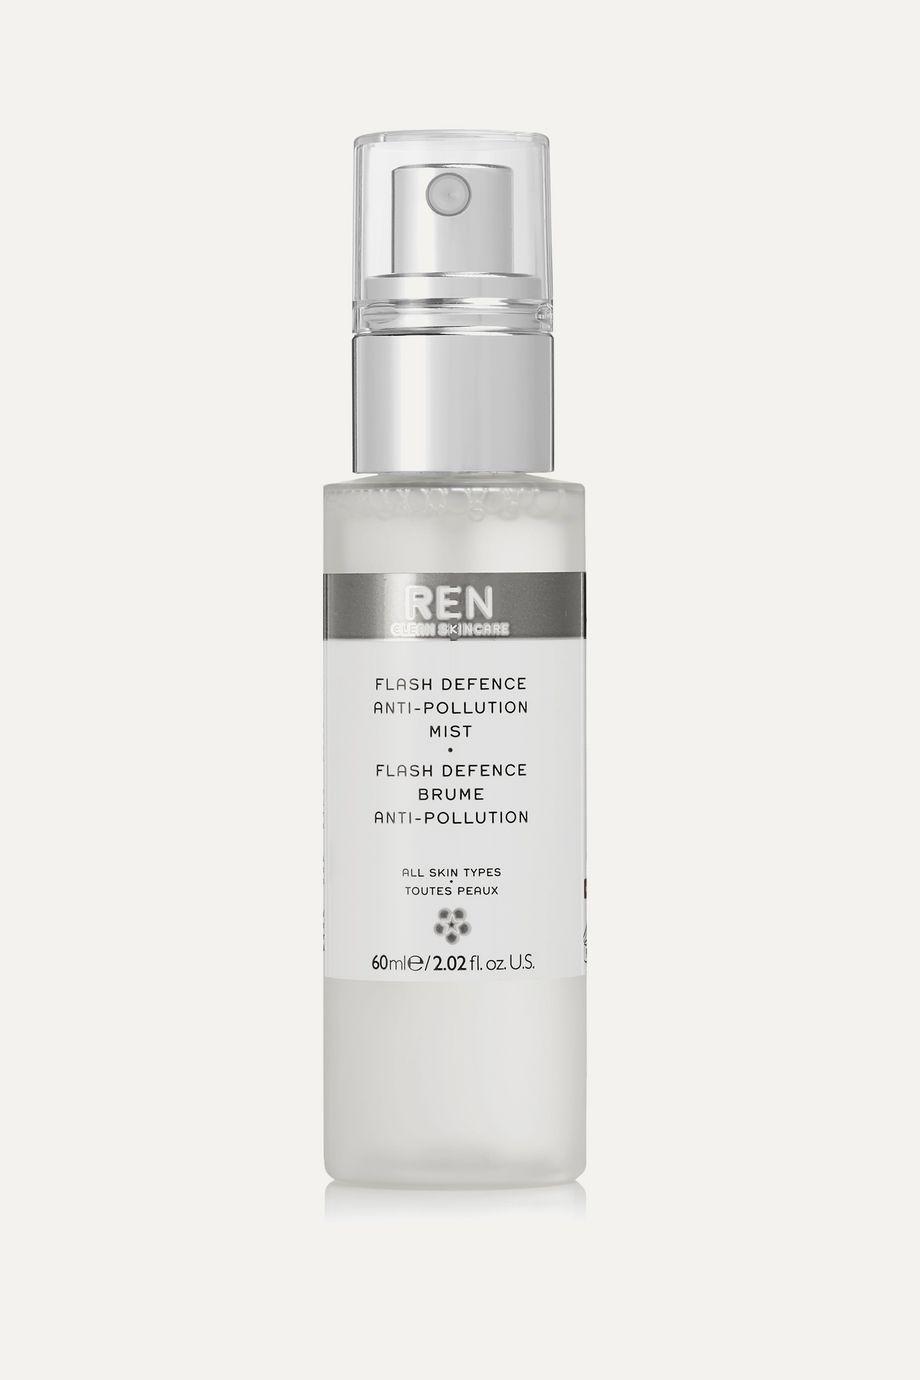 REN Clean Skincare Flash Defence Anti-Pollution Mist, 60ml